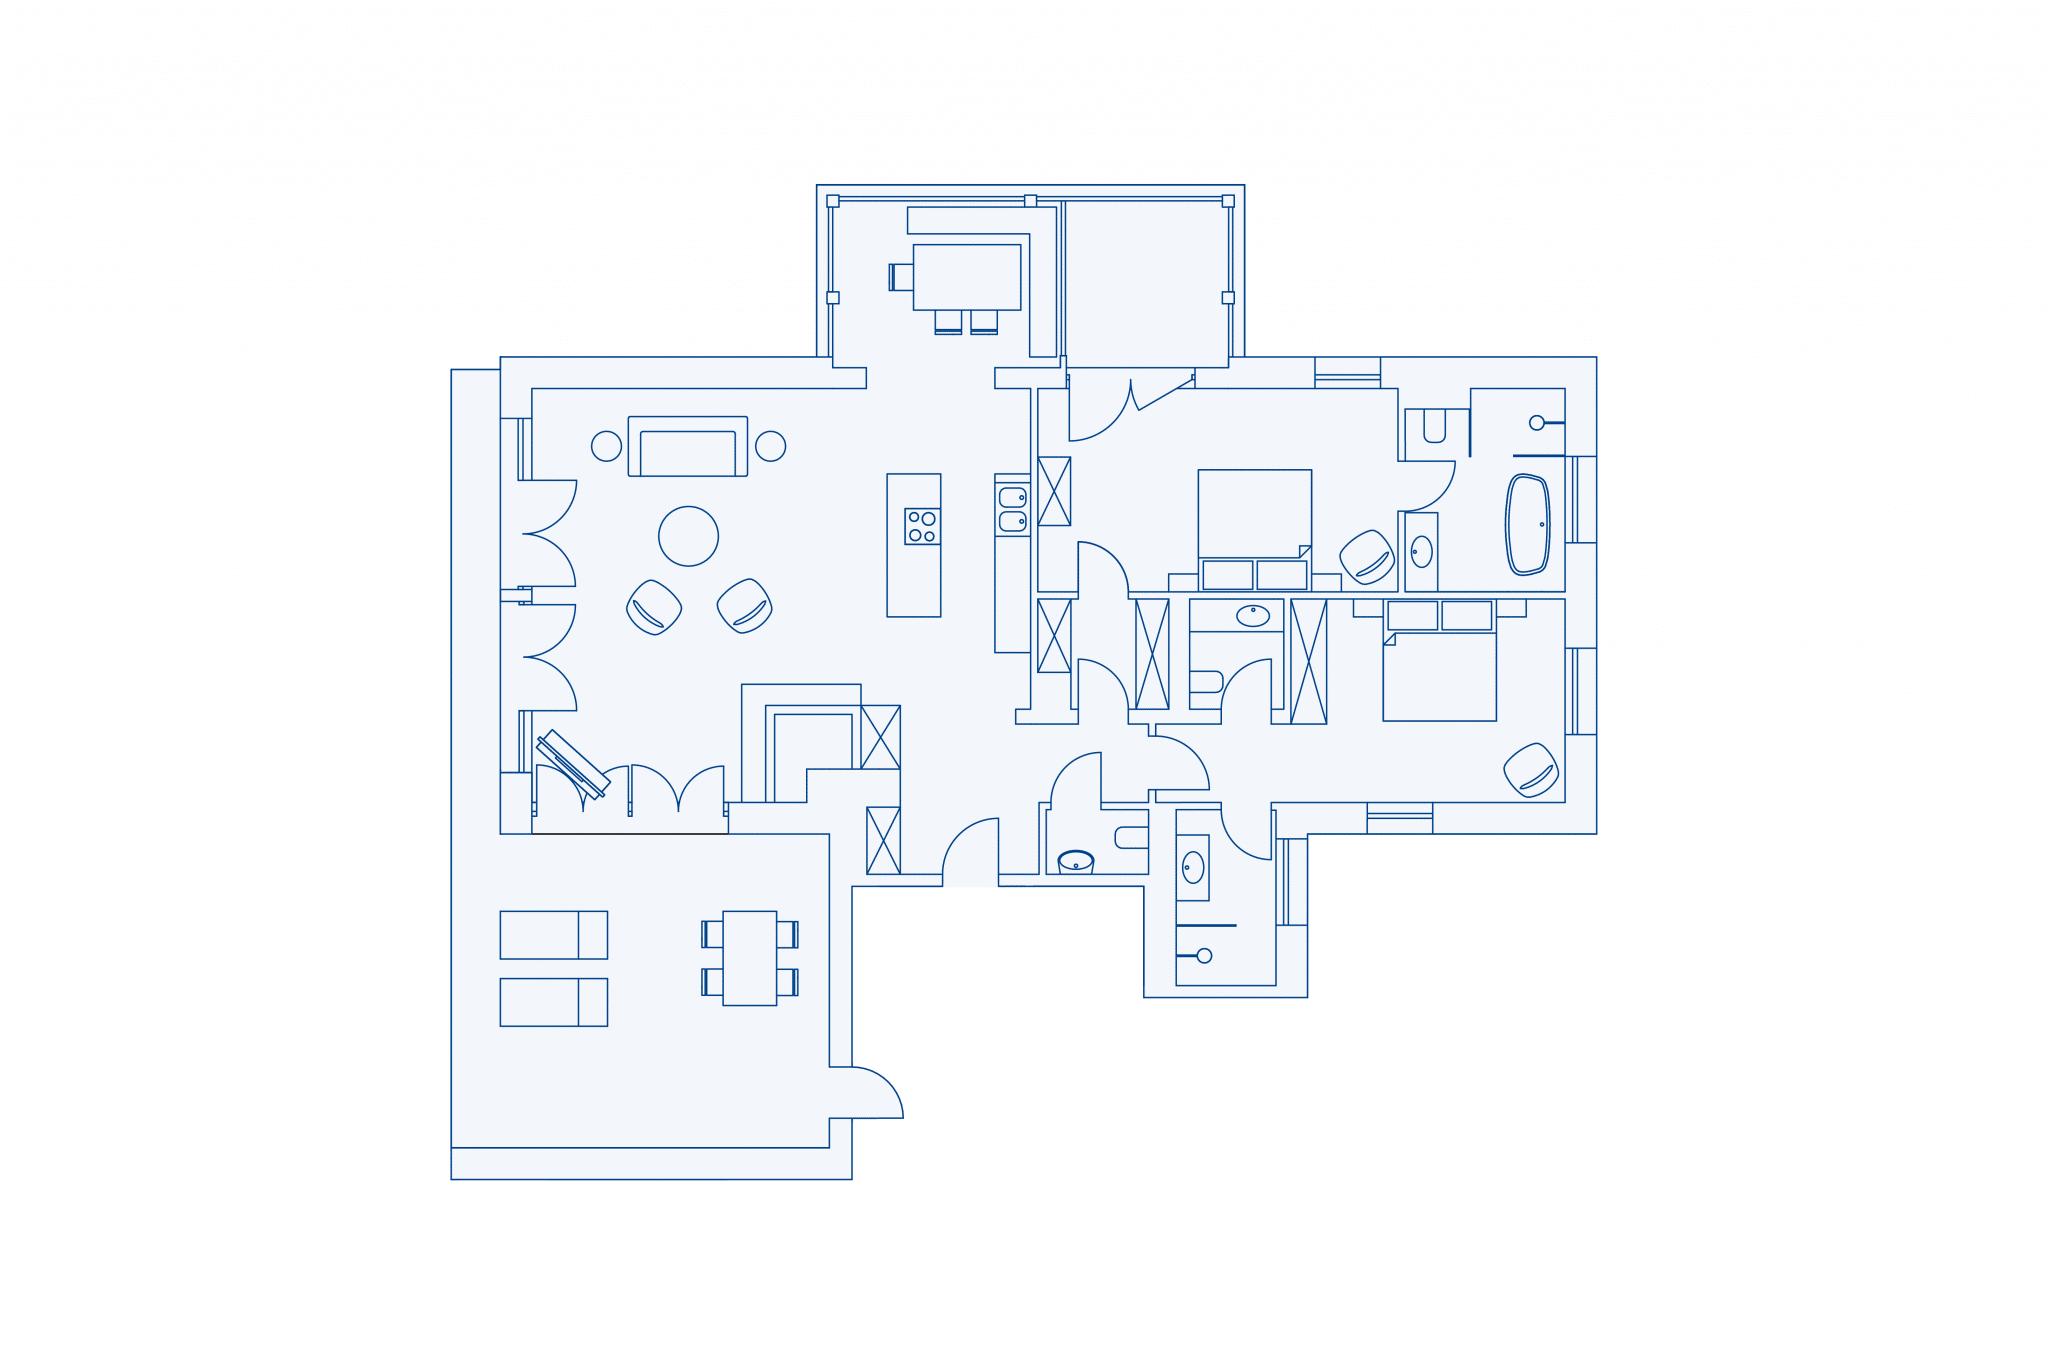 Room layout park residence 120 at VIVAMAYR Altaussee